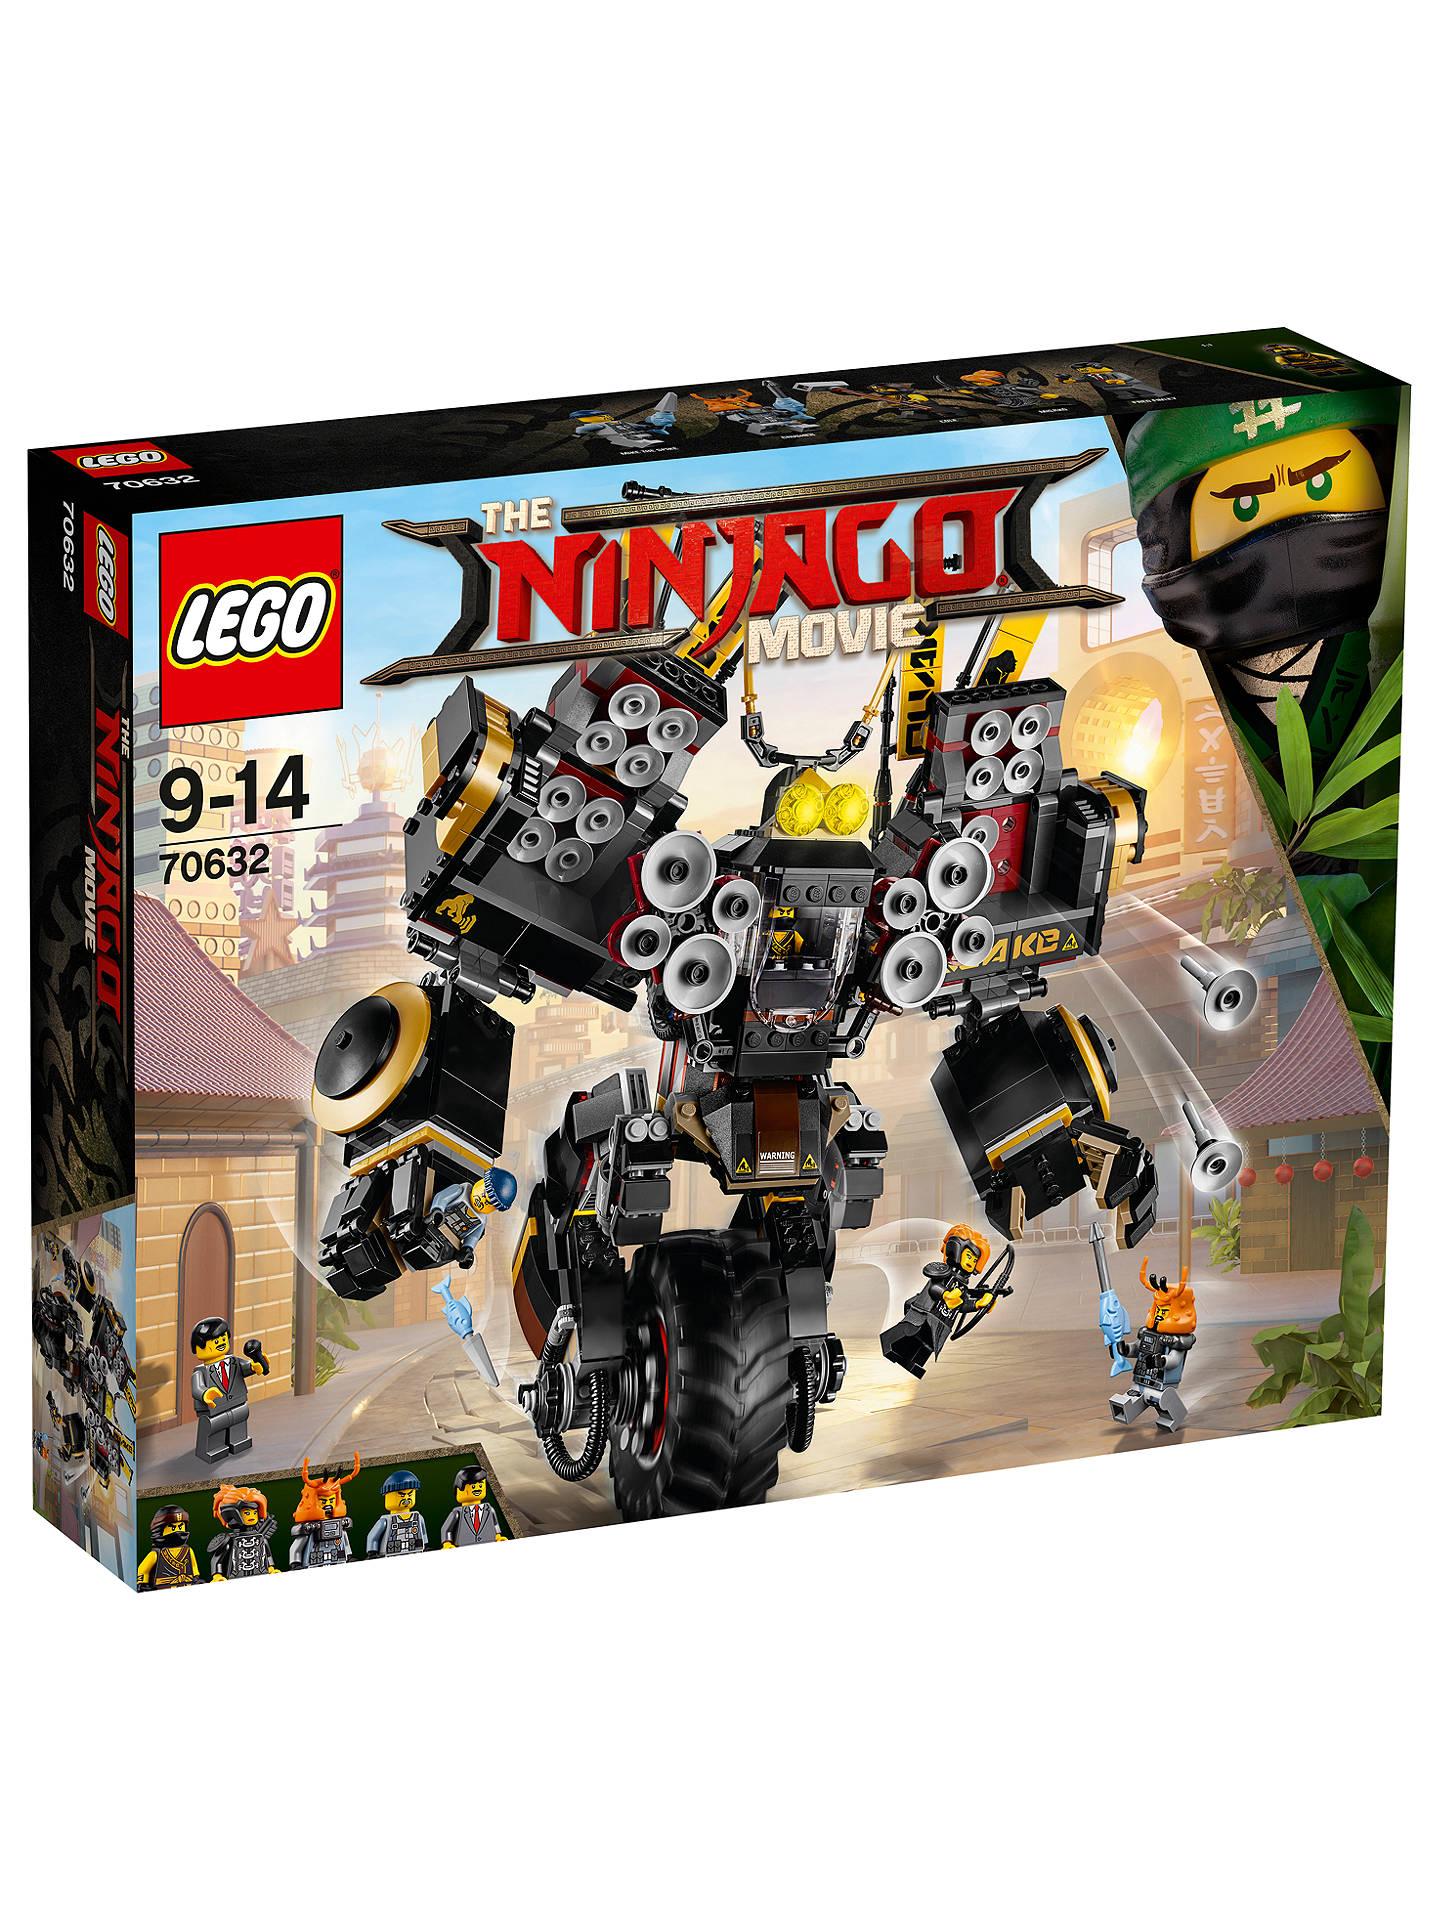 70631 split ZANE Minifigure LEGO NINJAGO 70615 70606